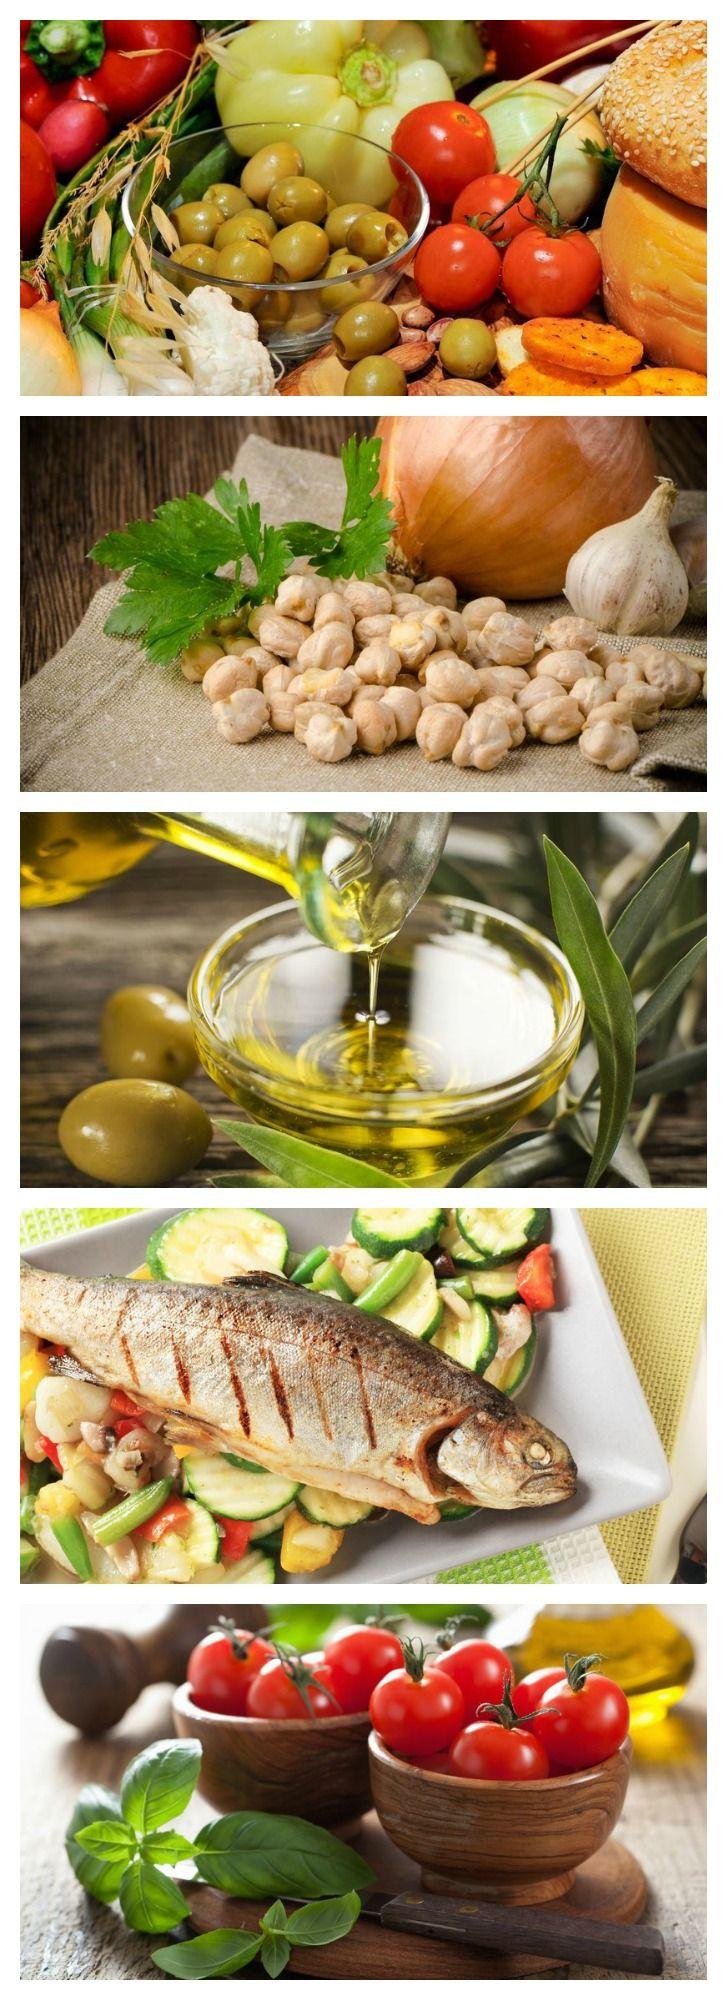 5 Mediterranean foods that lower cholesterol